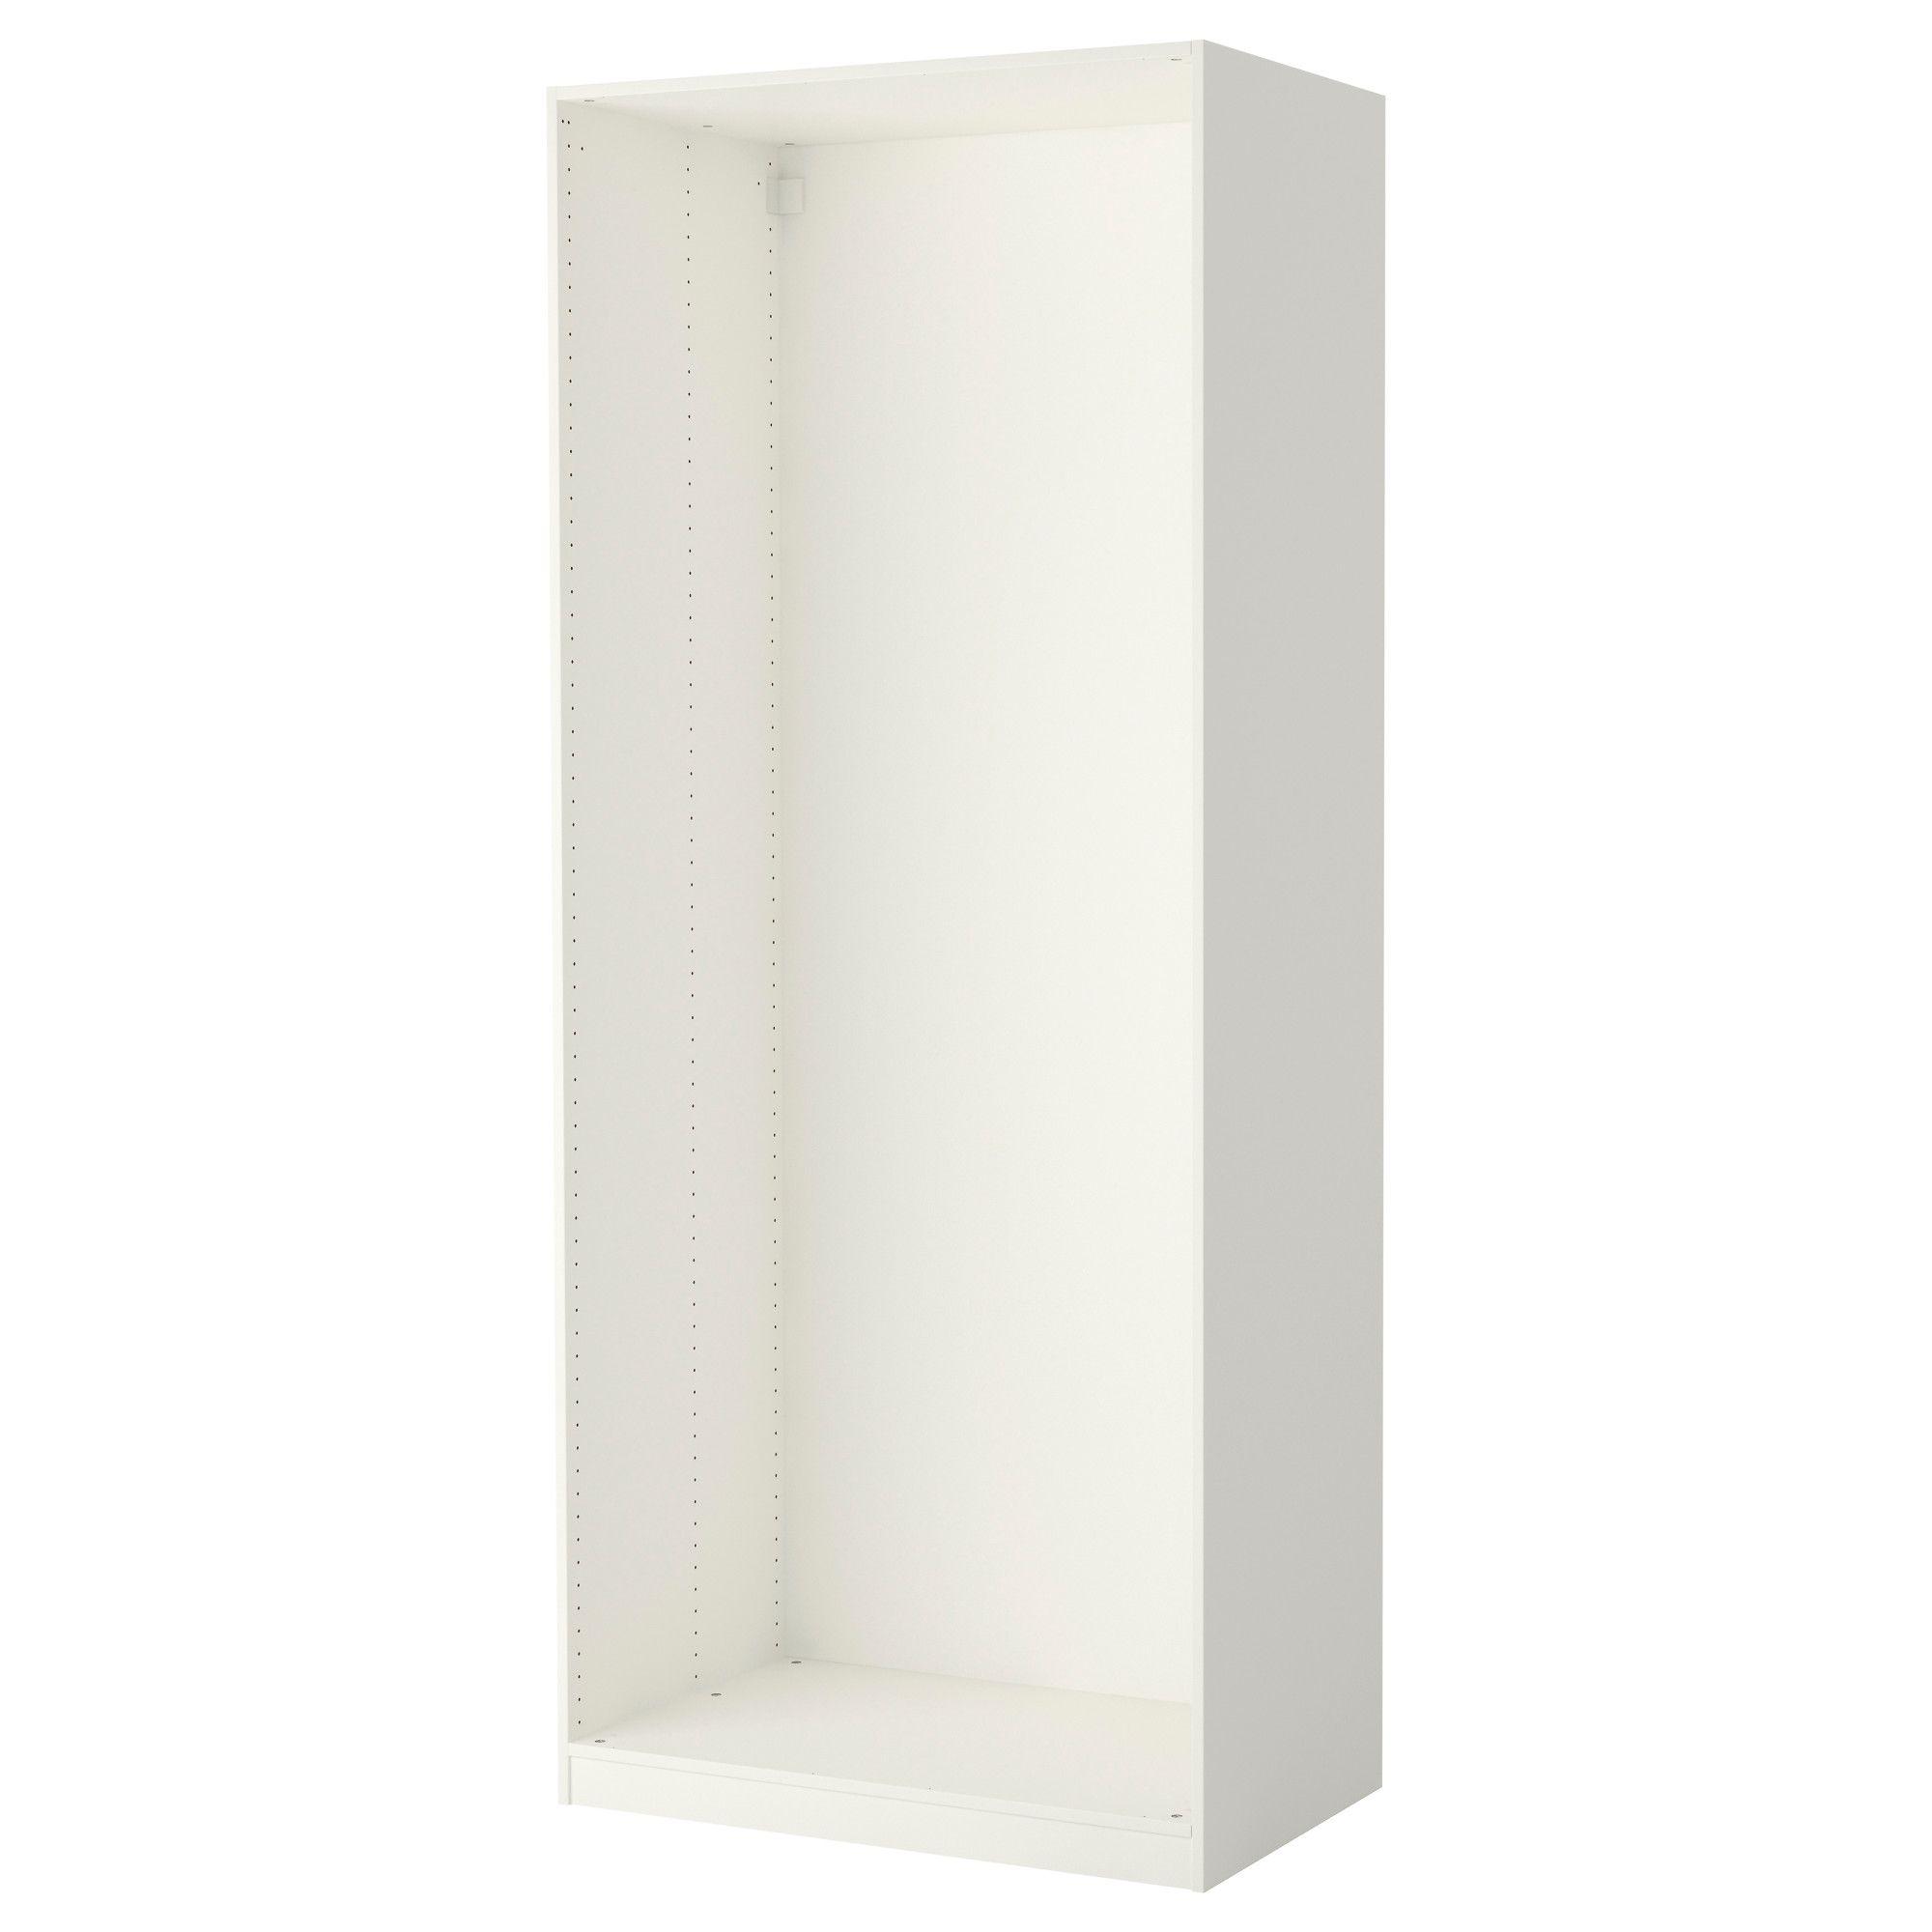 PAX Caisson d'armoire blanc 100x58x236 cm Armoire